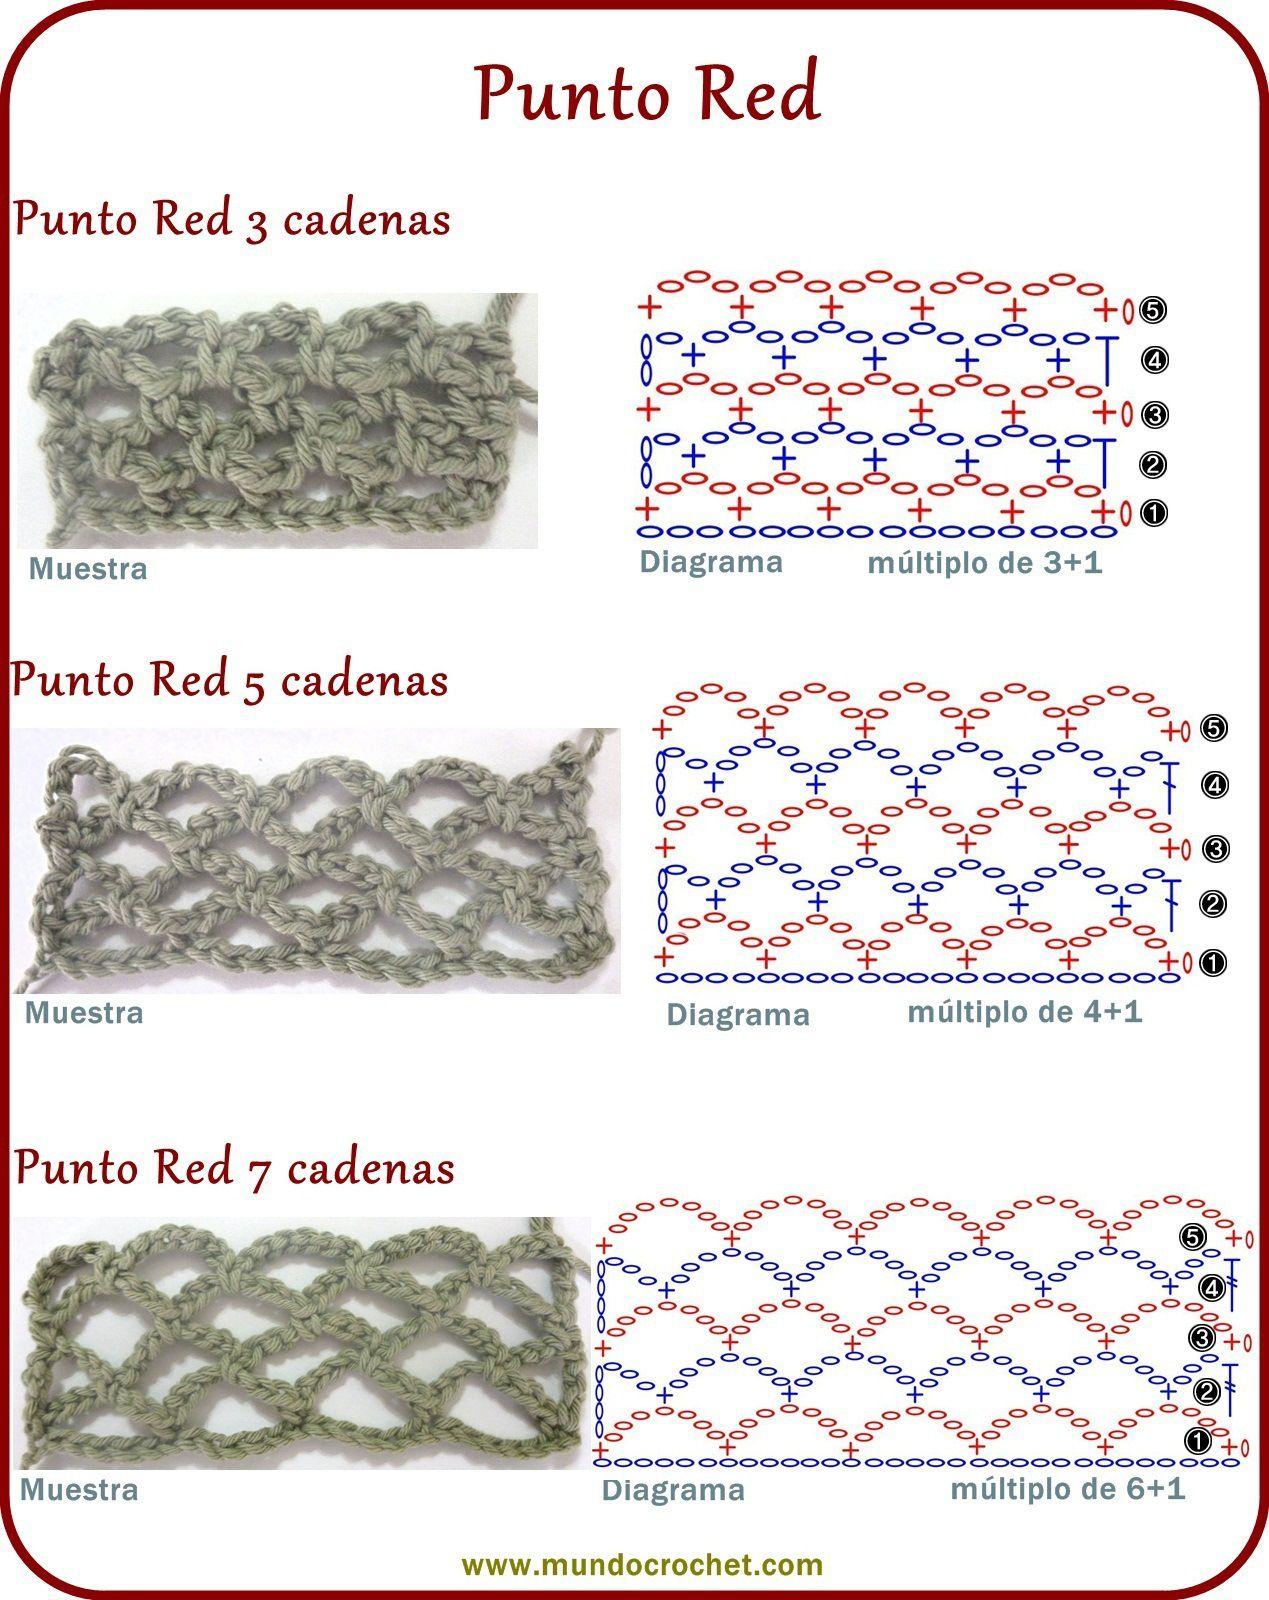 Punto red - Crochet stitch - вязание крючком пунктов | Крючок ...